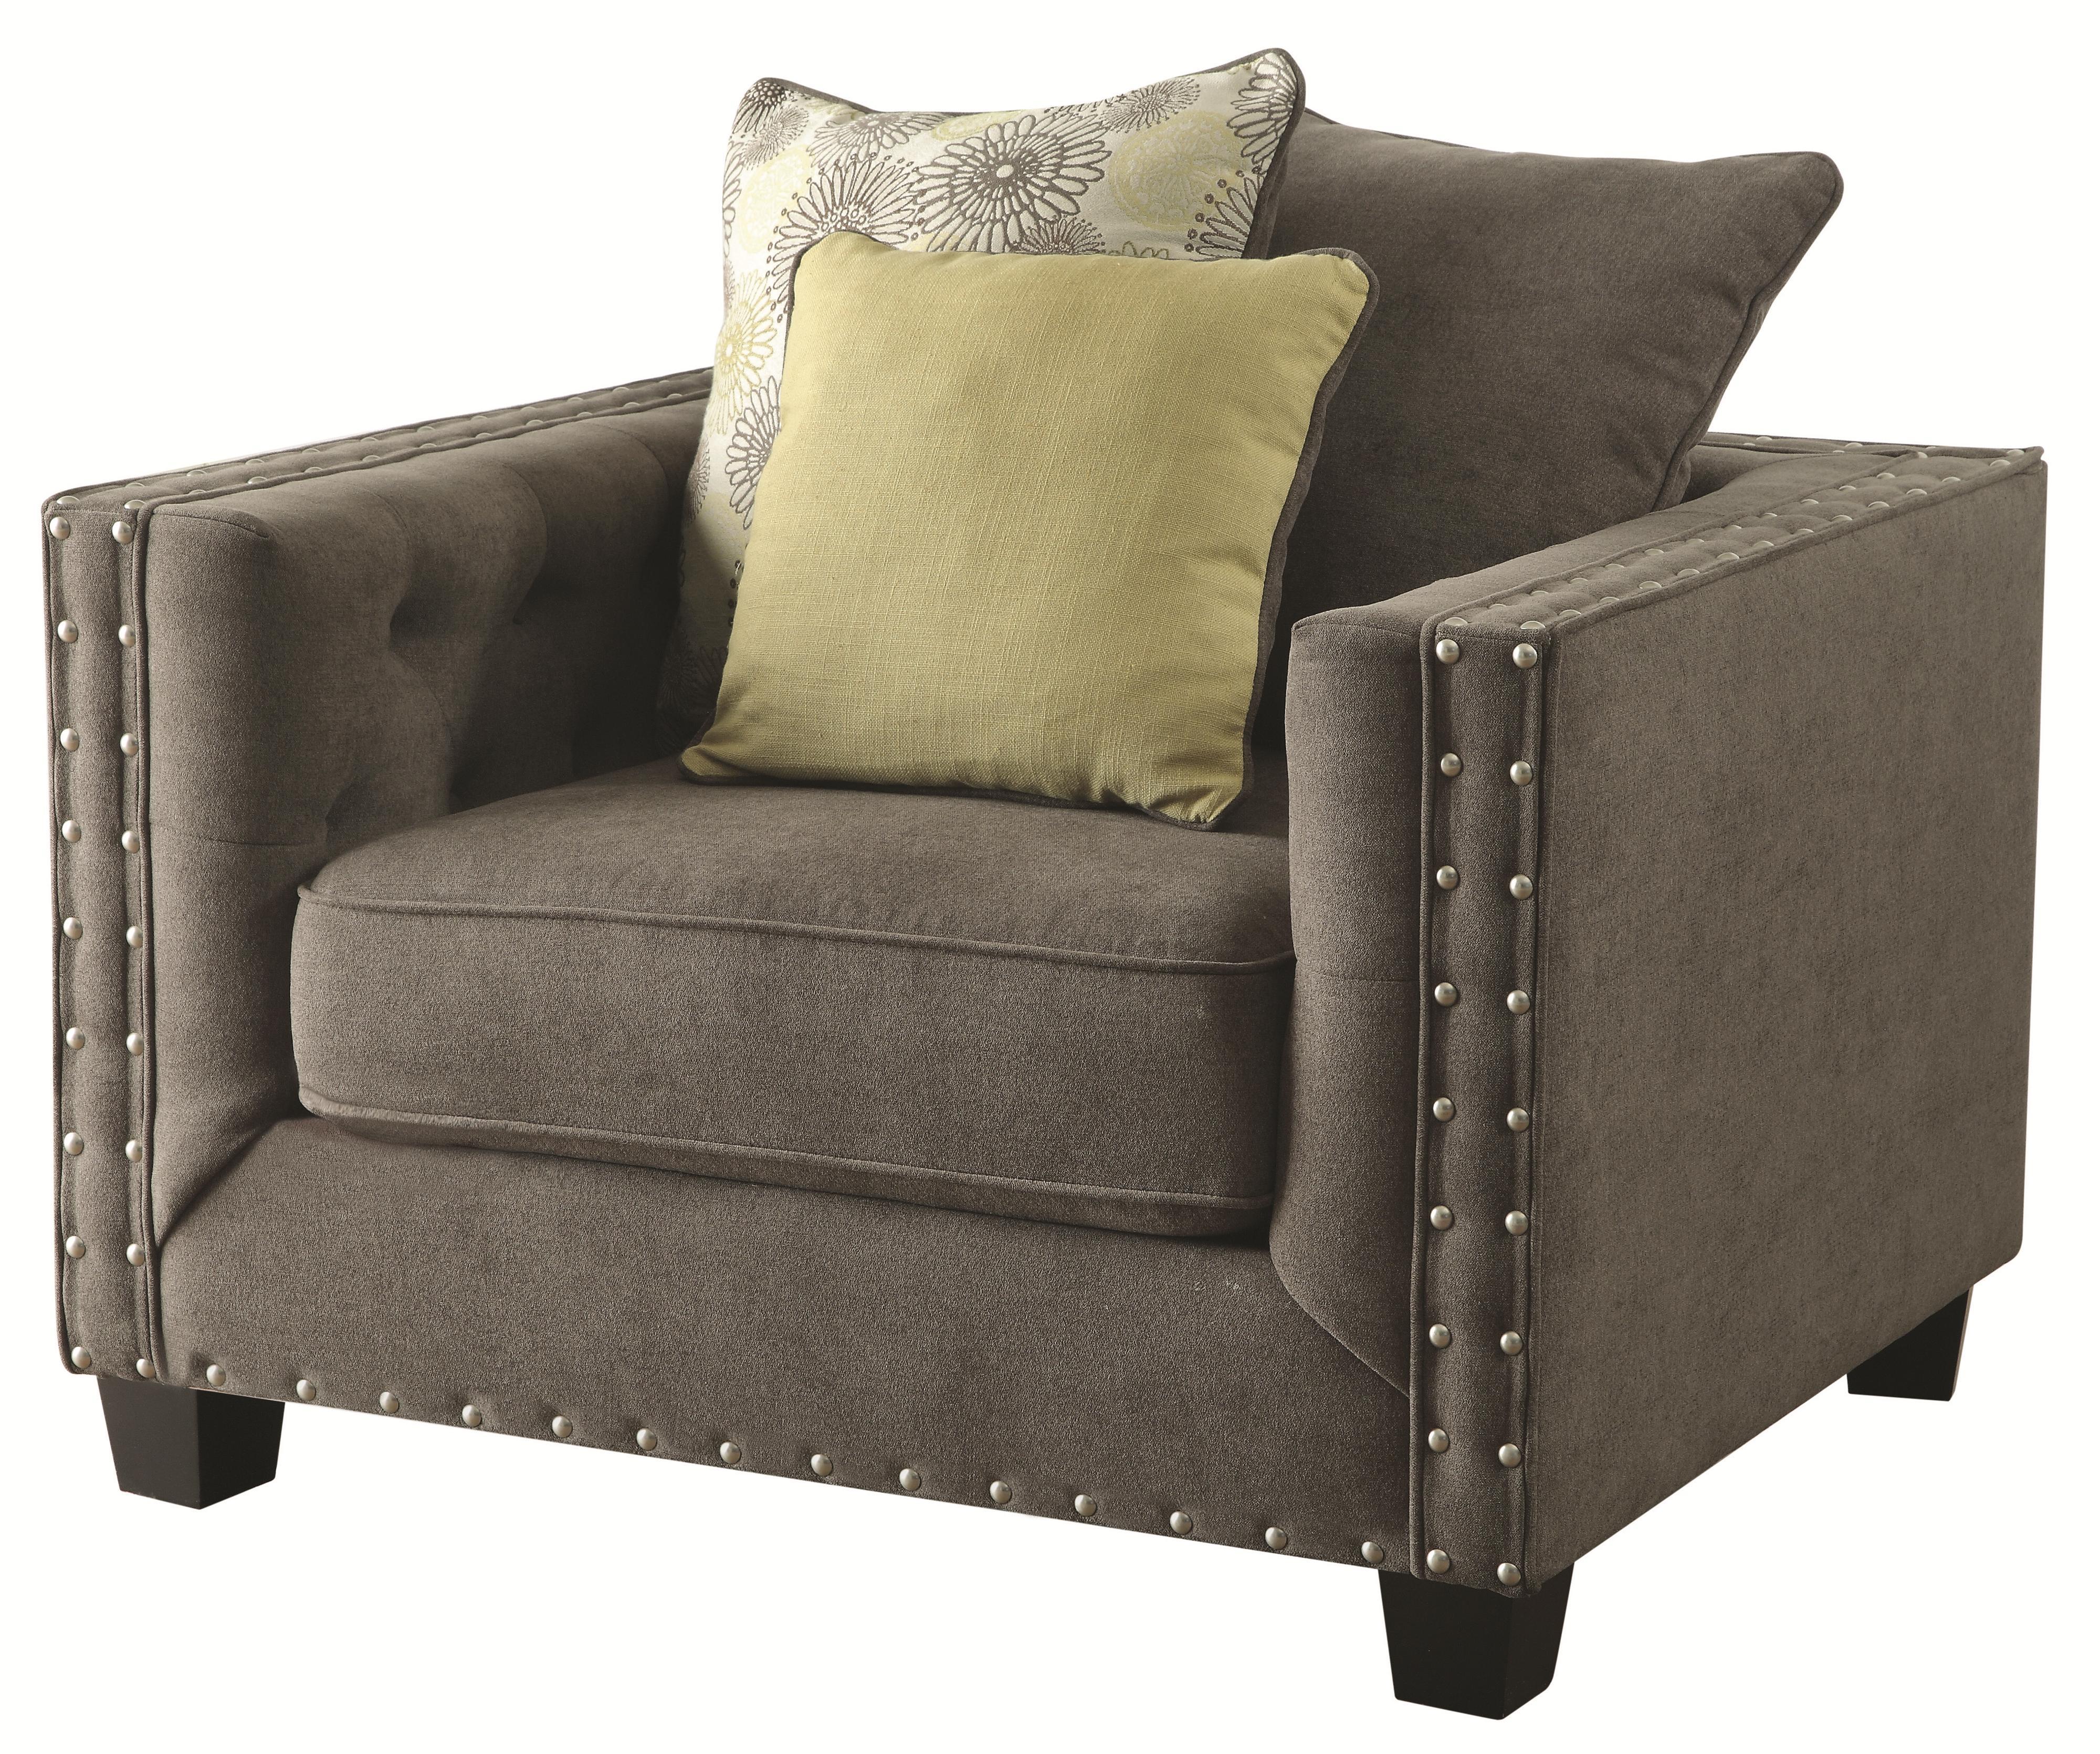 Coaster Kelvington Upholstered Chair - Item Number: 501423-Kelvington Charcoal